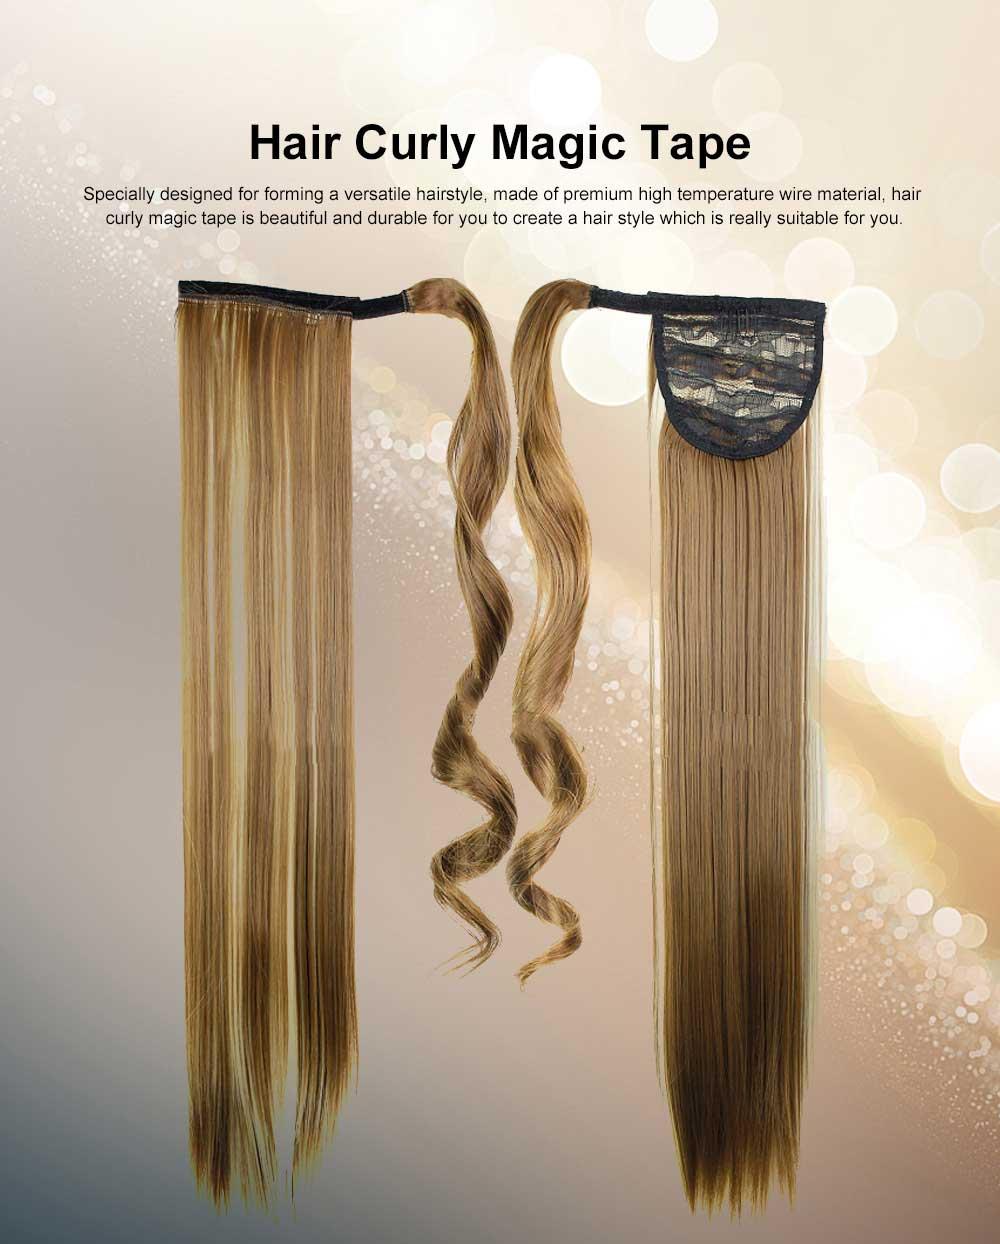 Lifelike & Vivid Wig Chemical Fiber Long Straight Hair Curly Magic Tape with Binding Design 0